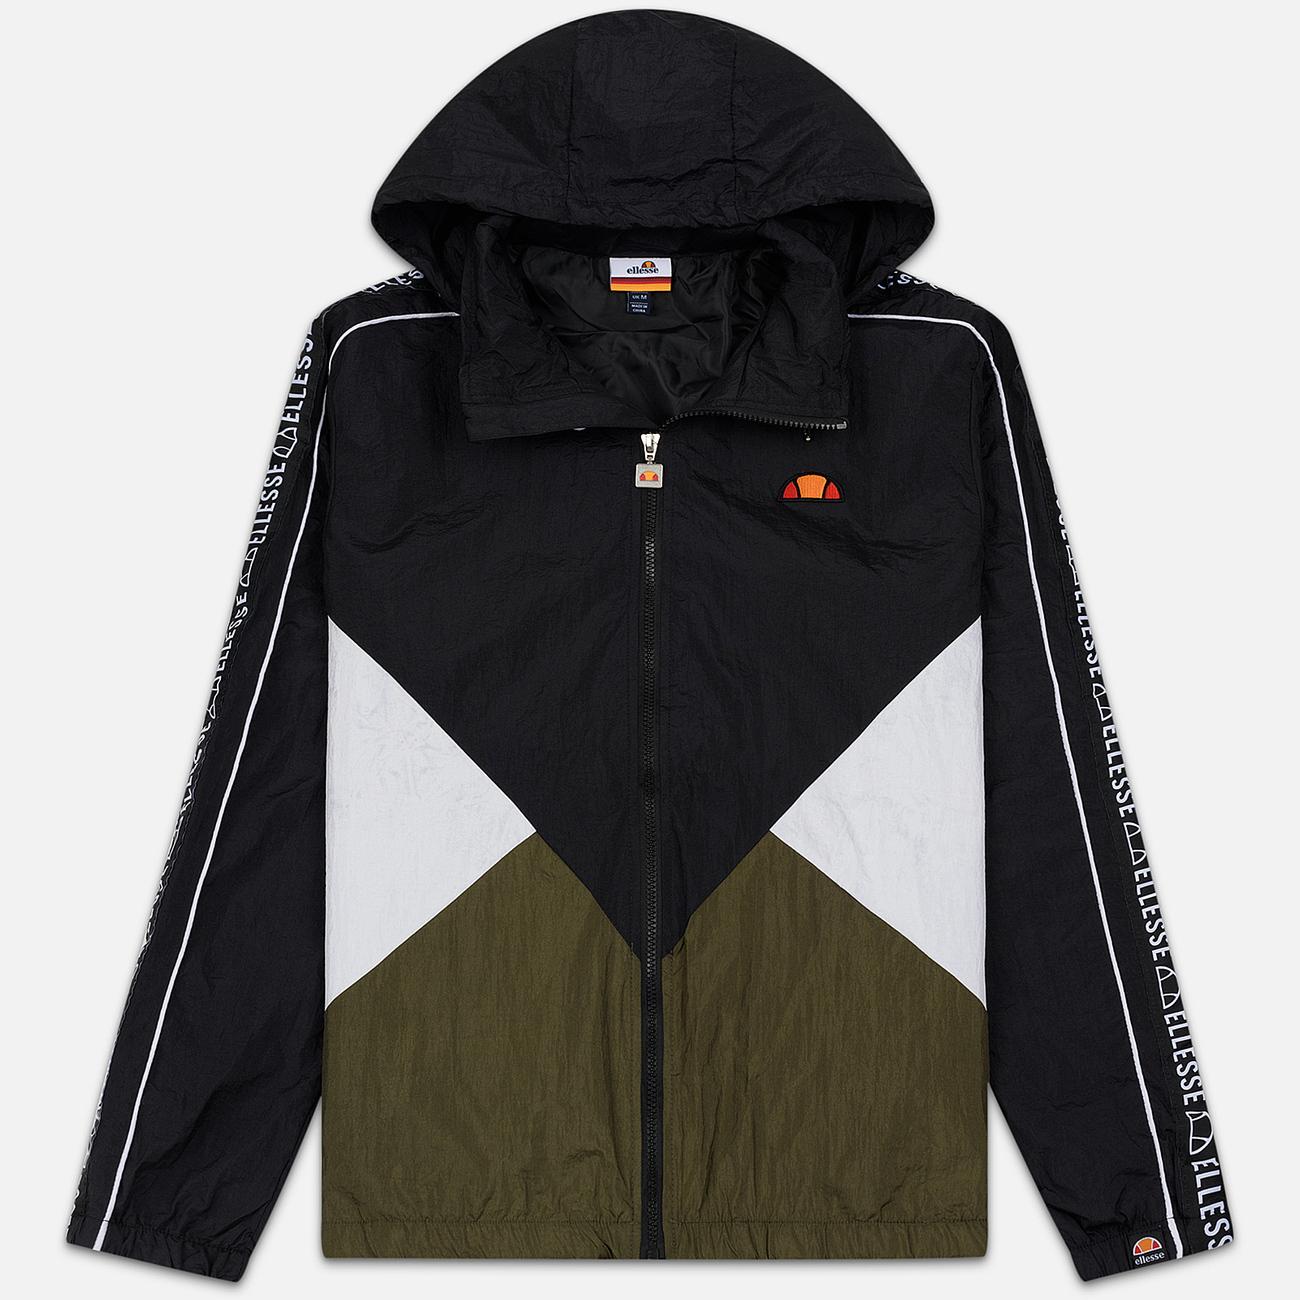 Мужская куртка ветровка Ellesse Lapaccio Black